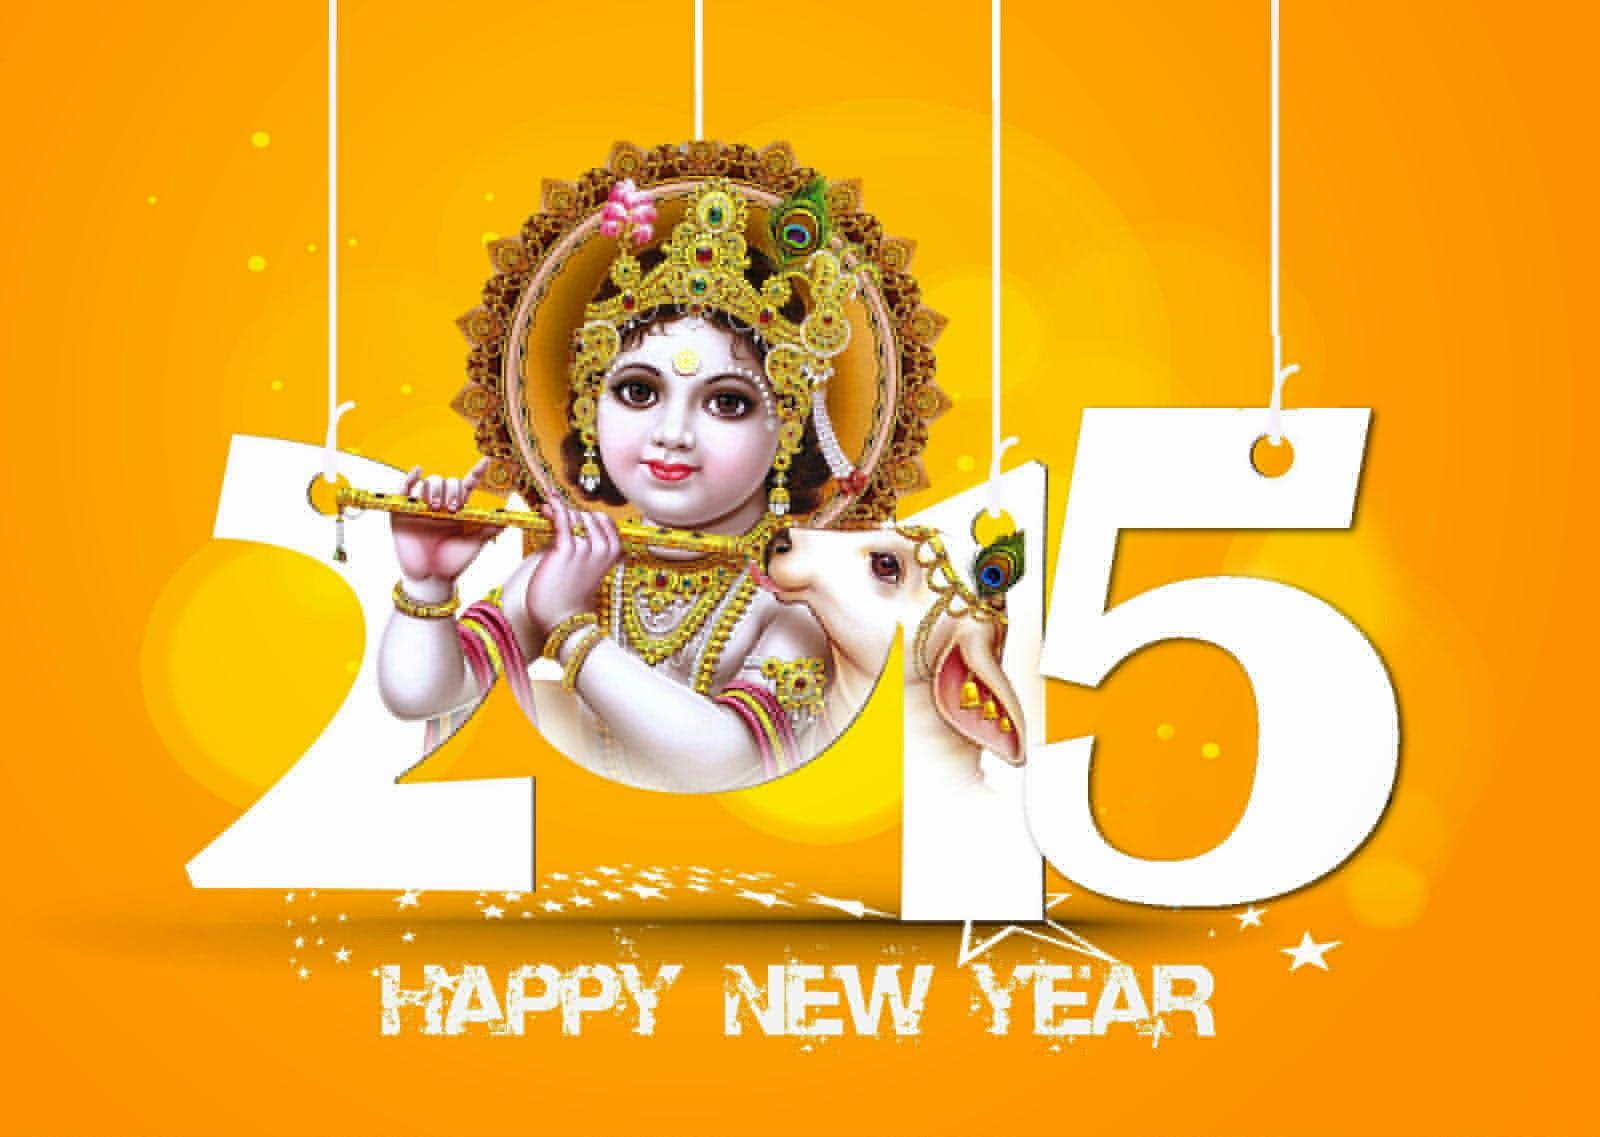 Happy New Year Lord Krishna Lord Krishna Happy New Year